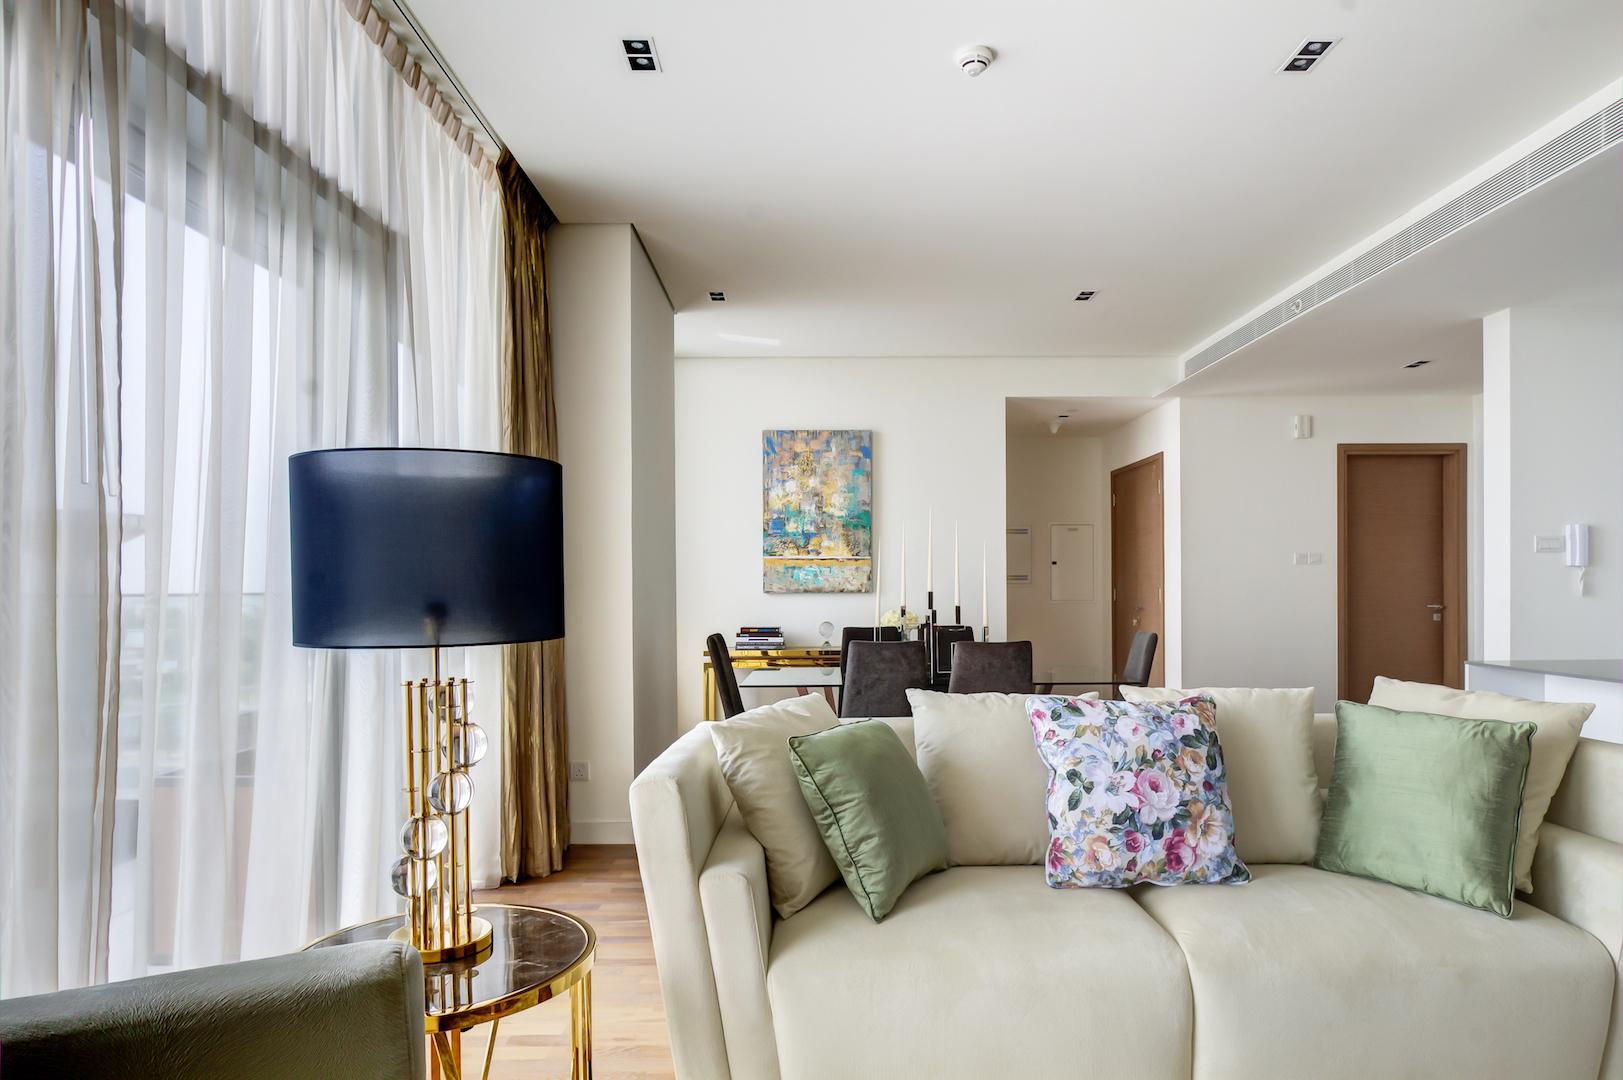 Apartment Elegant 1 BR in City Walk B1 602 photo 20906828